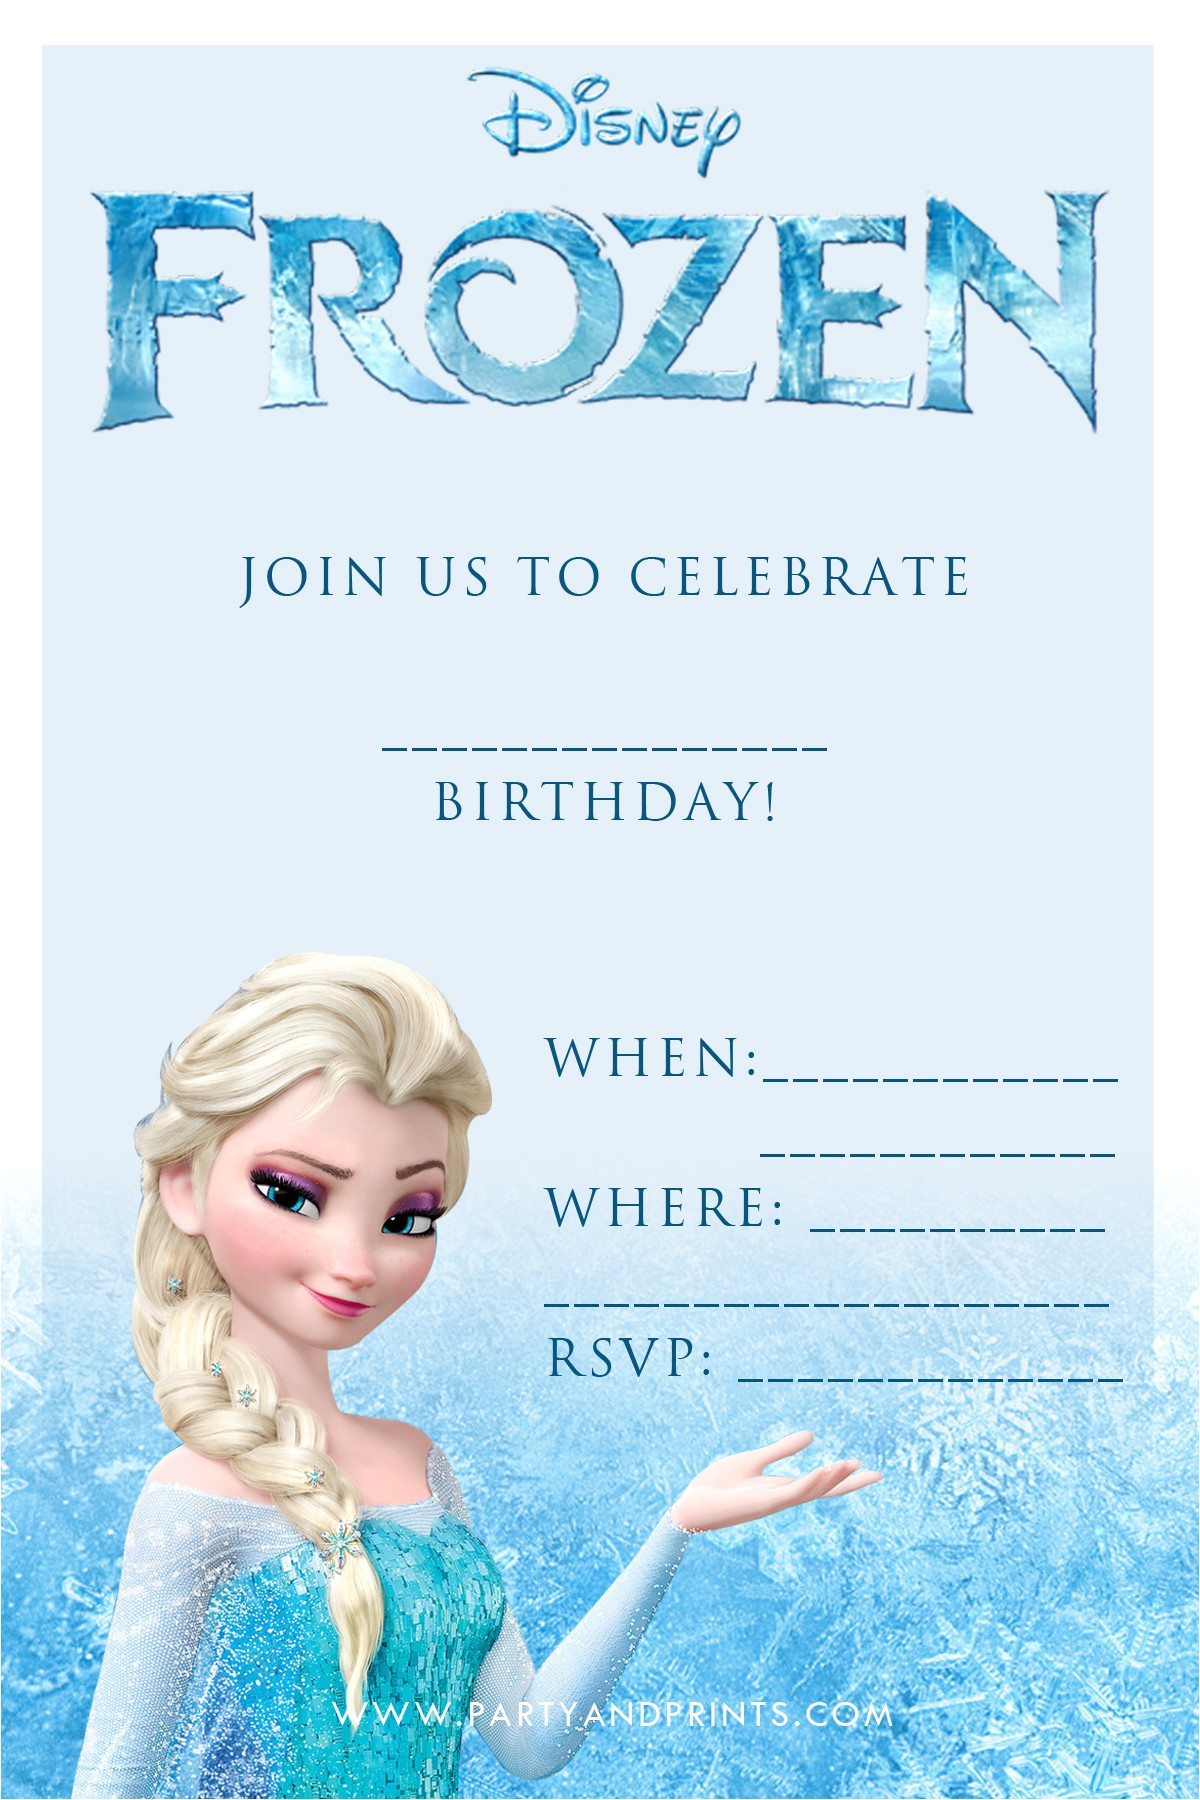 Frozen Birthday Party Invitations Online 20 Frozen Birthday Party Ideas